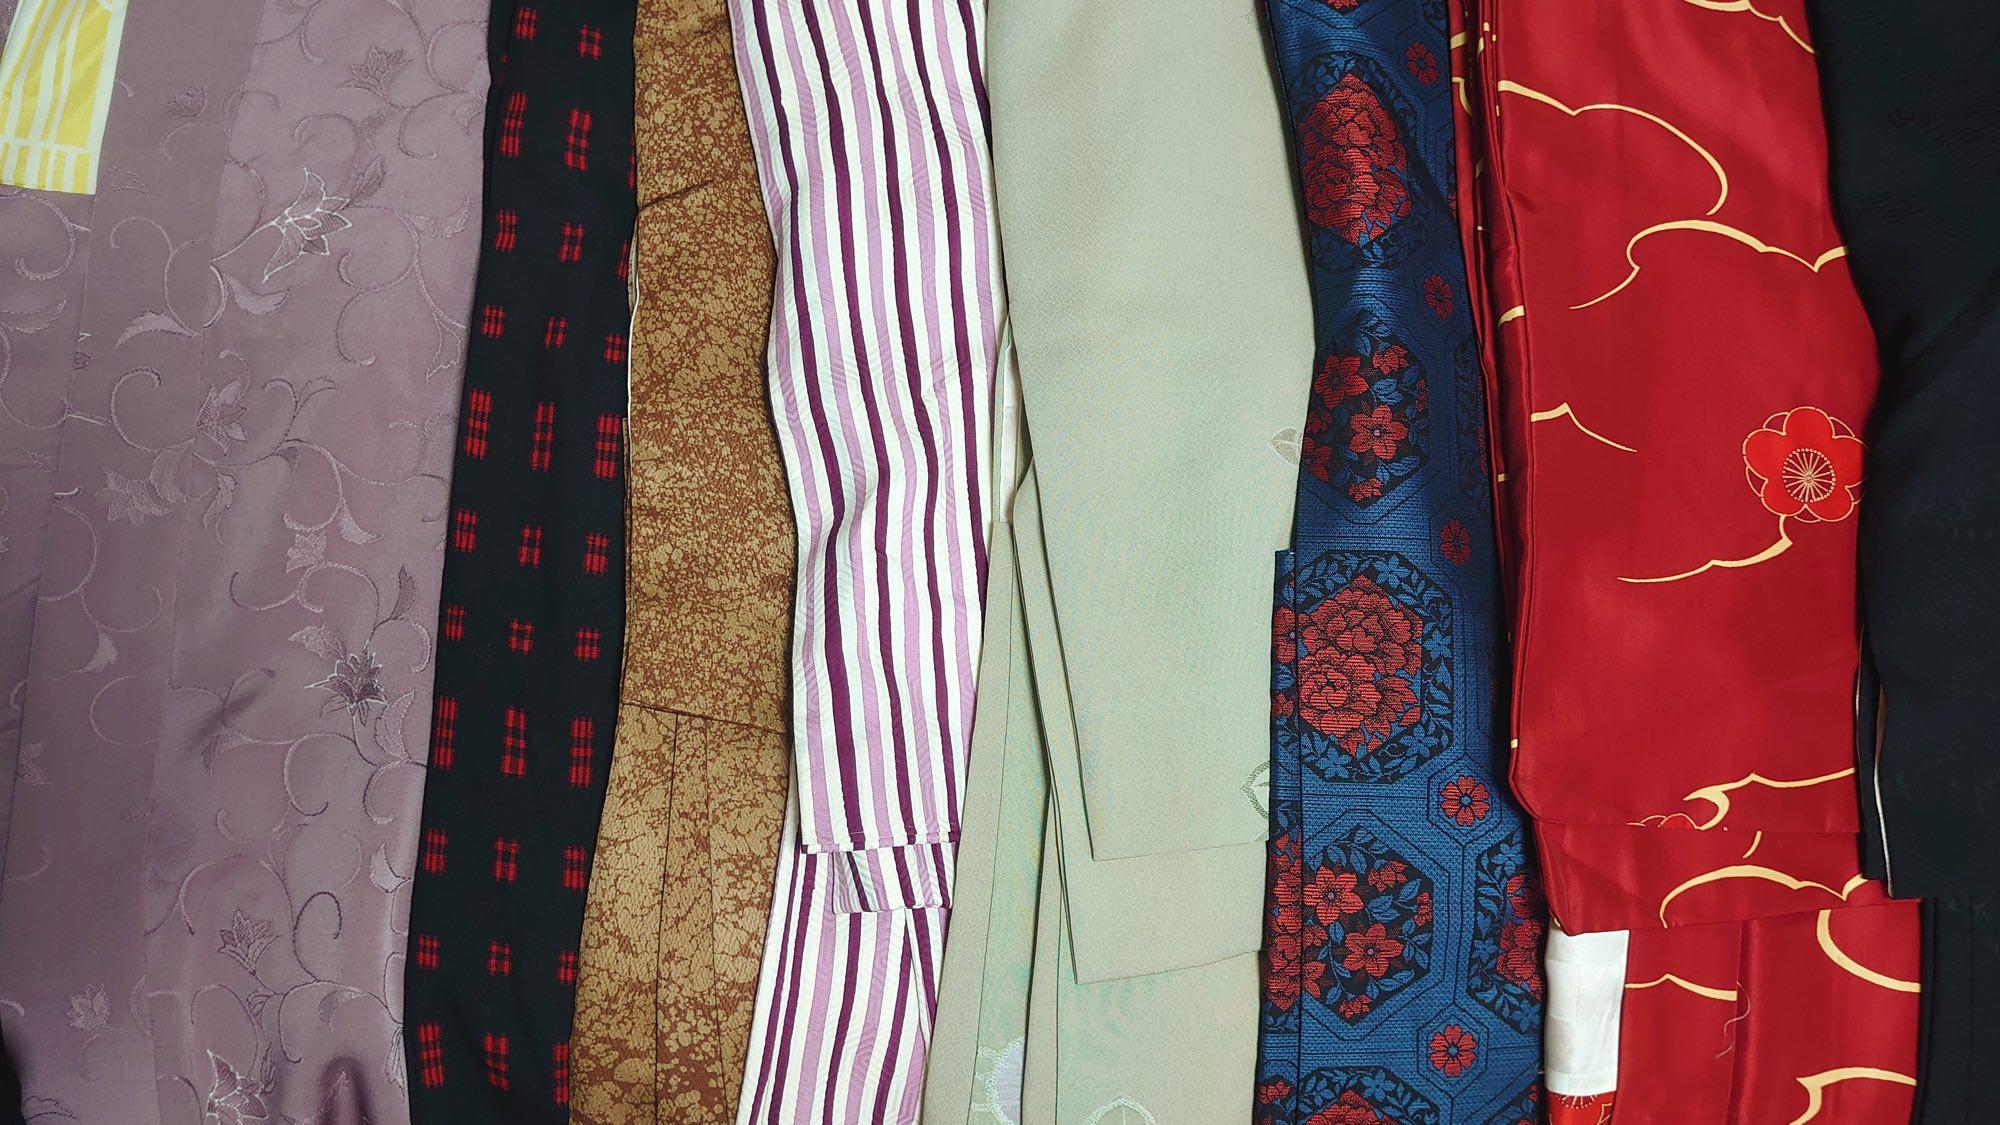 Kimono Fashion With A Twist - Haori layered out